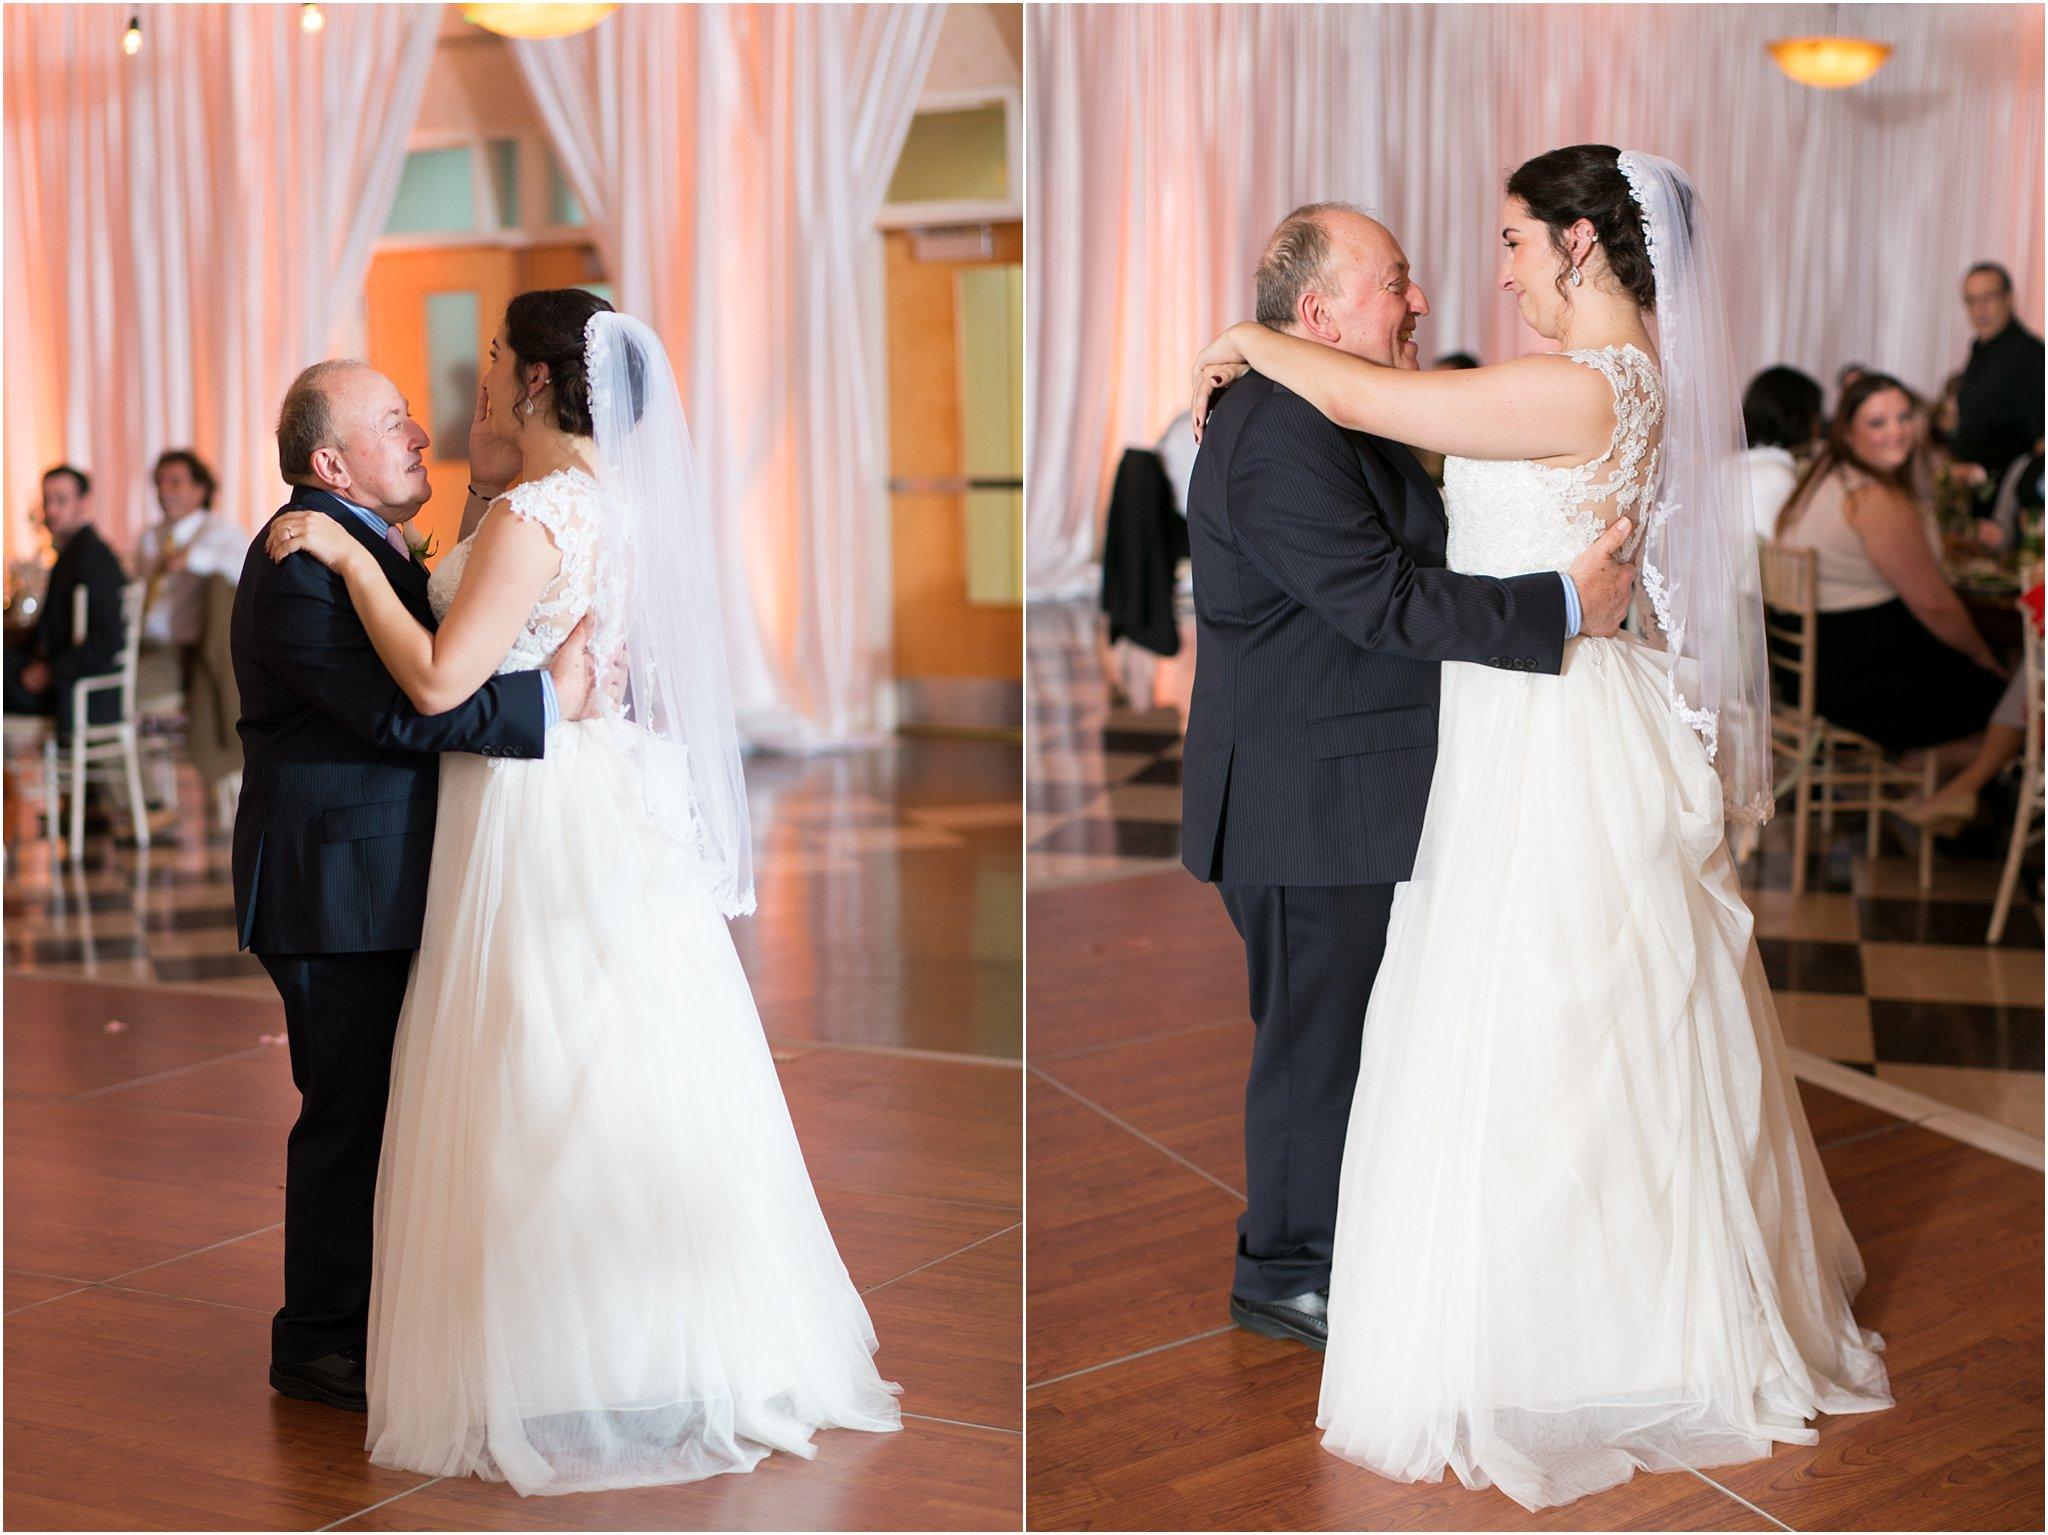 jessica_ryan_photography_virginia_wedding_photographer_wedding_hurricane_norfolk_botanical_gardens_hurricane_matthew_wedding_3631